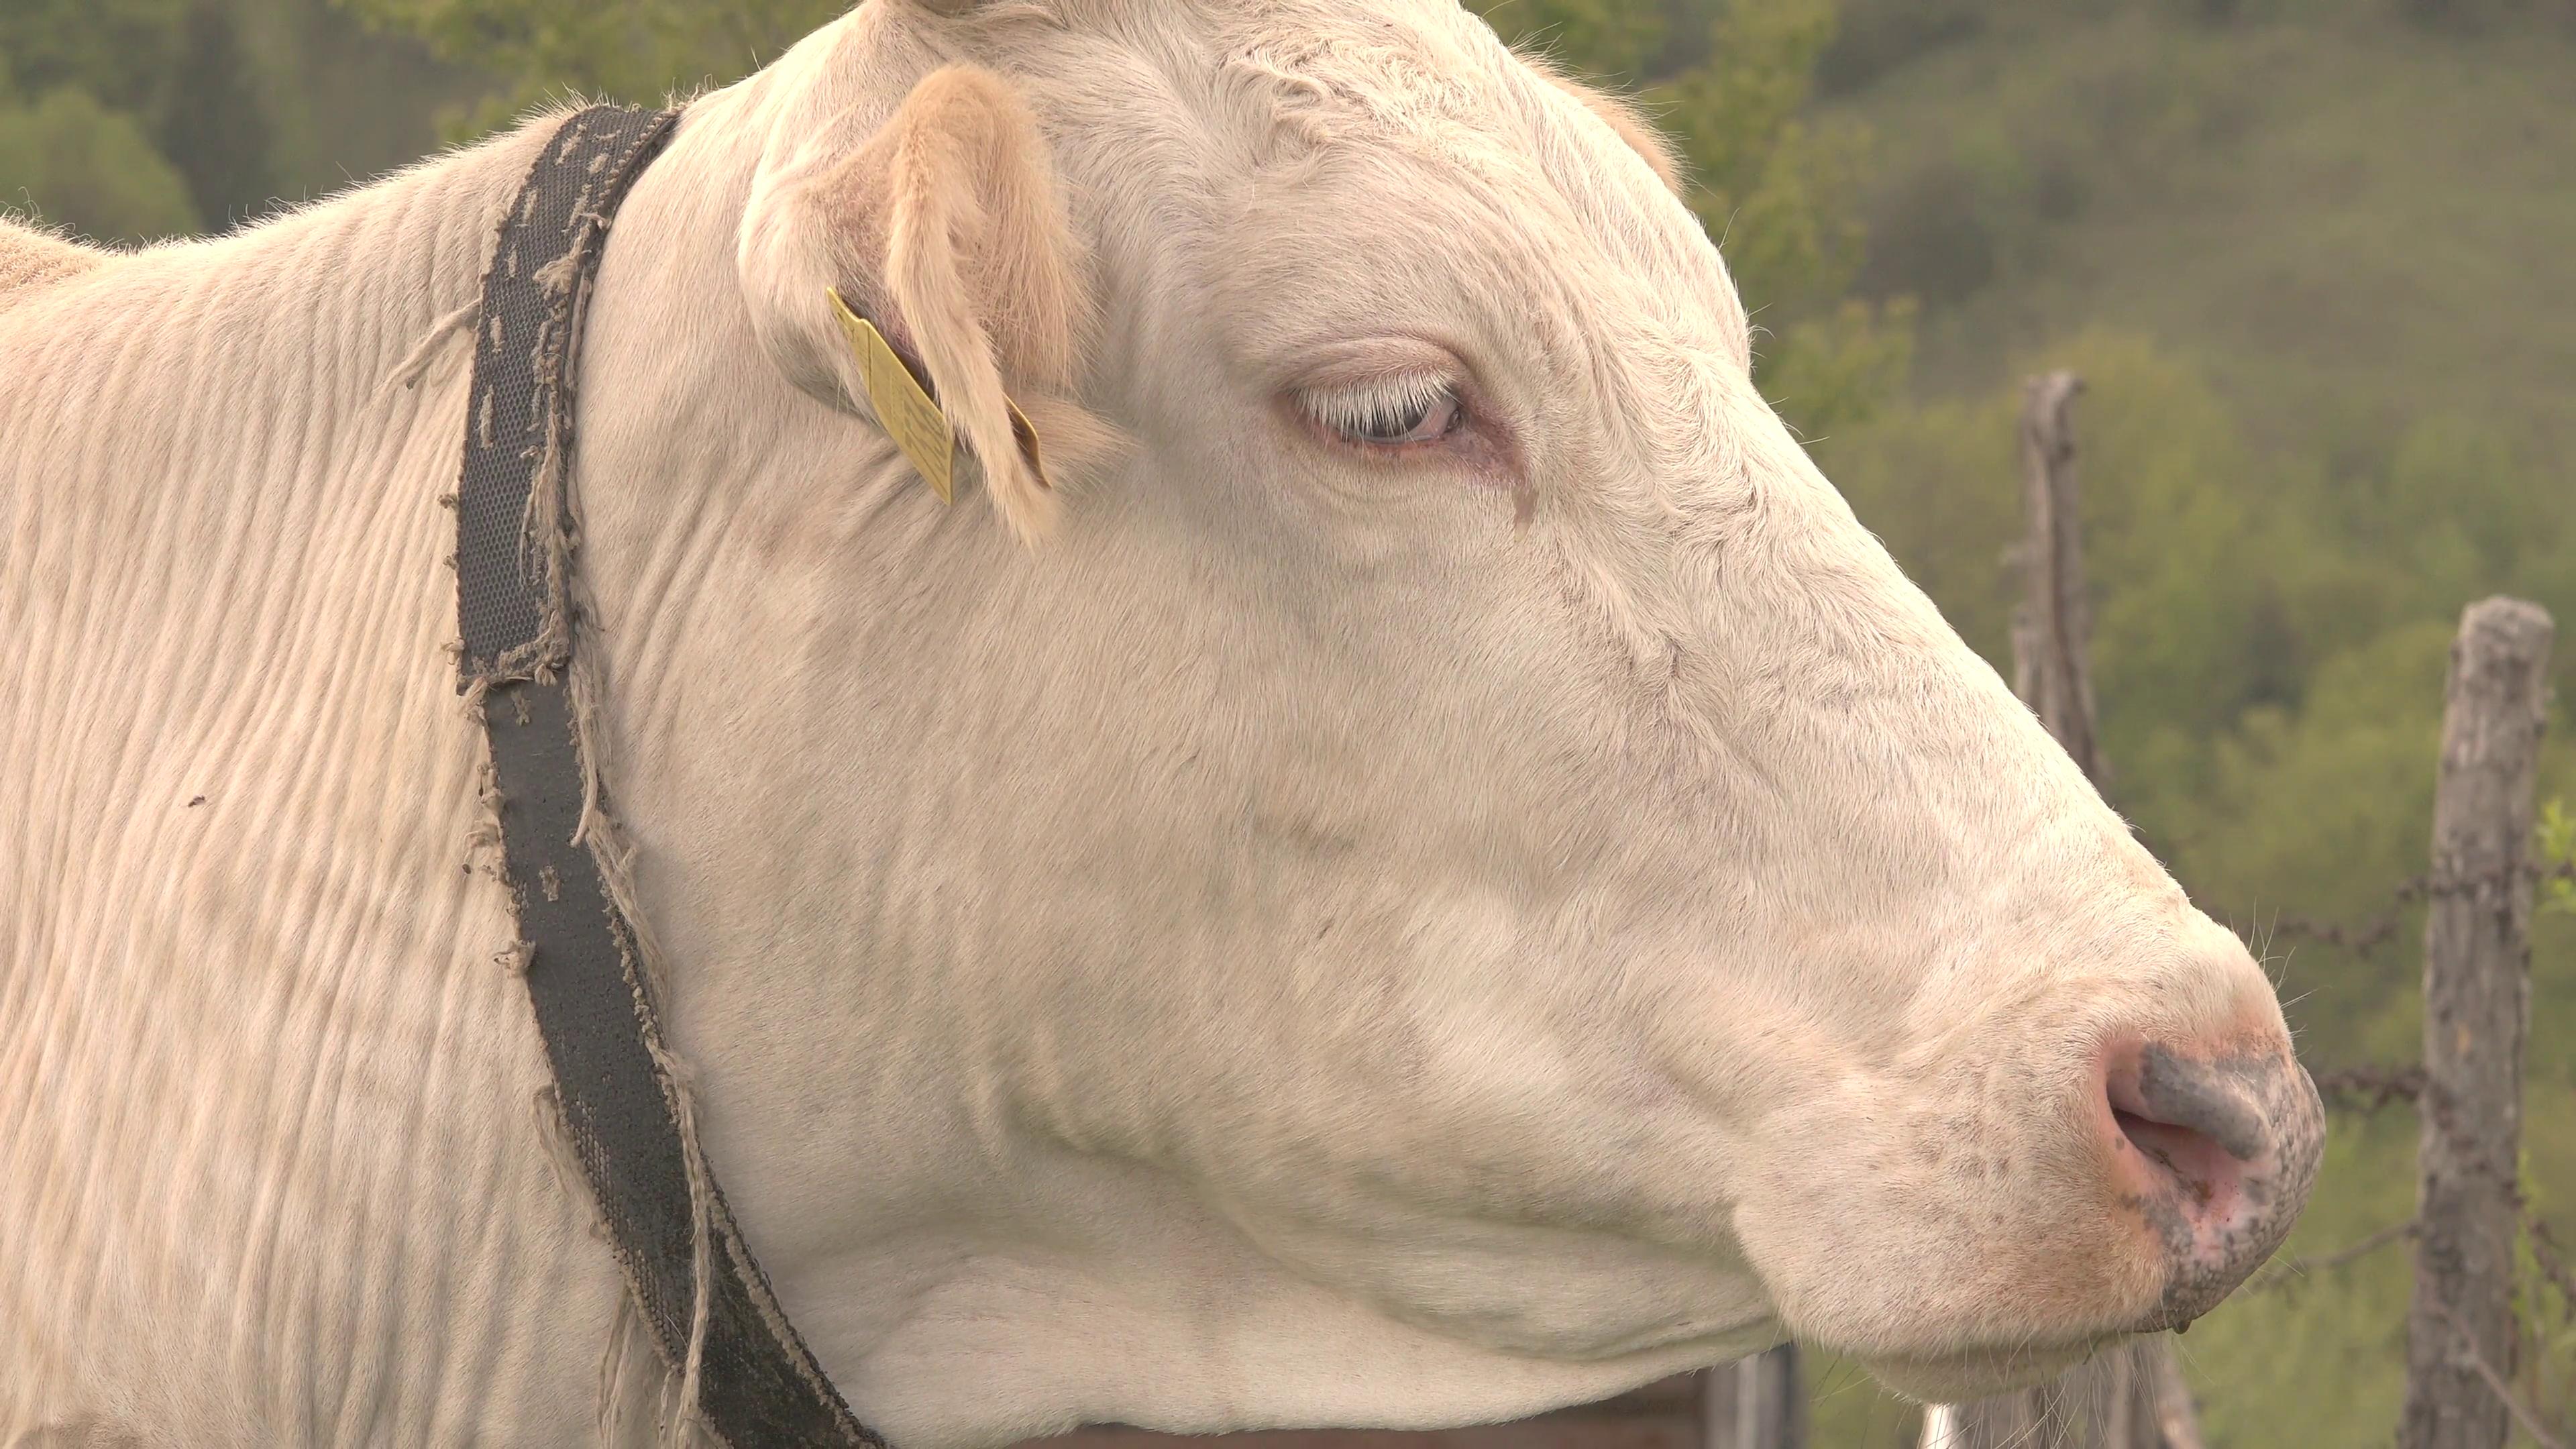 Cow Head PNG HD - 140181